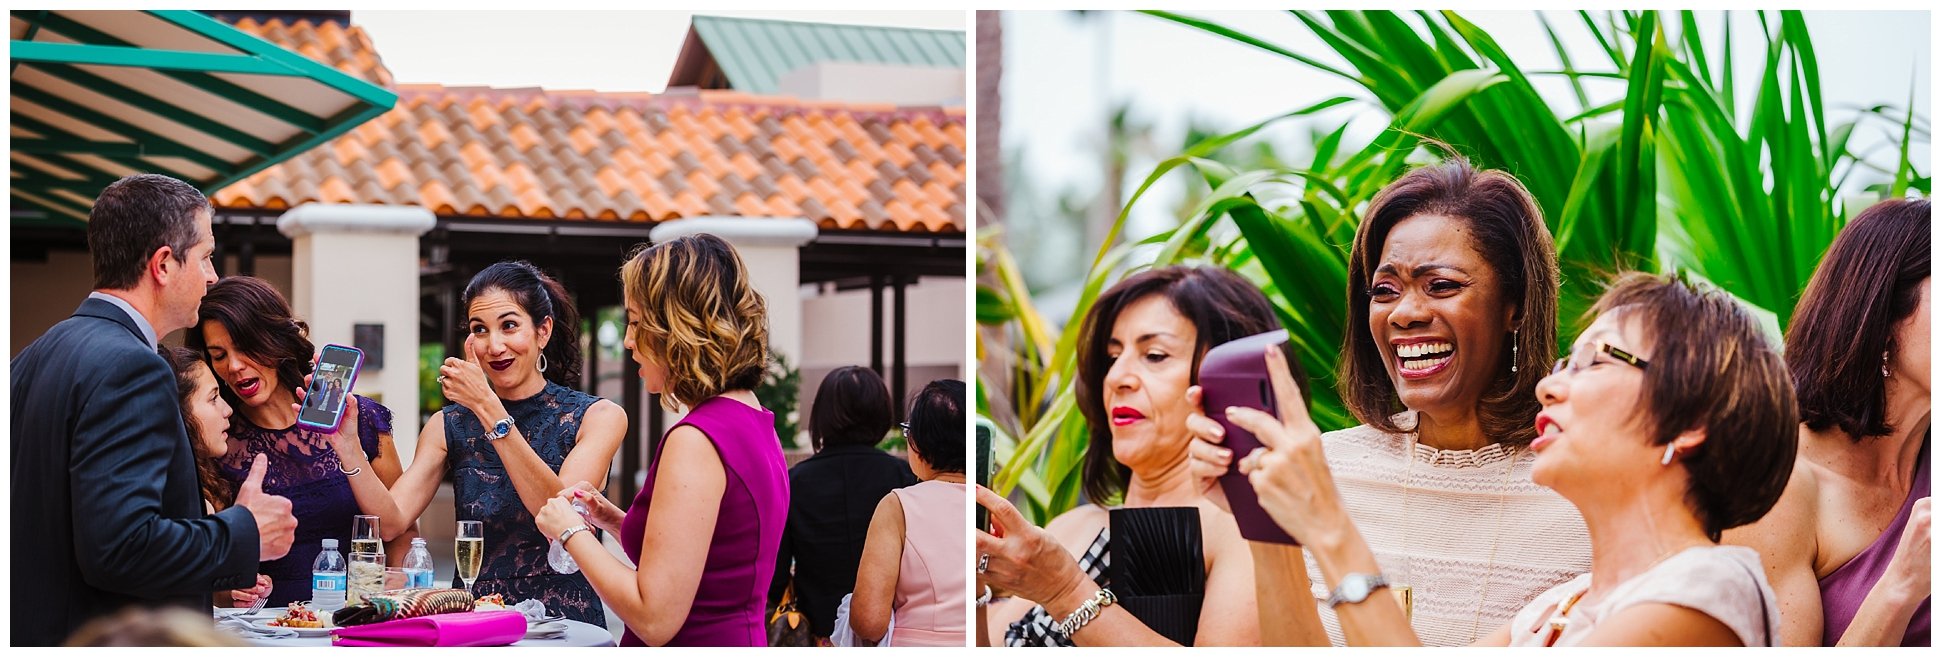 vinoy-sunset-ballroom-rainy-day-wedding-photography-orchids-trinidad-flawless-fetes-ashlee-hamon_0133.jpg